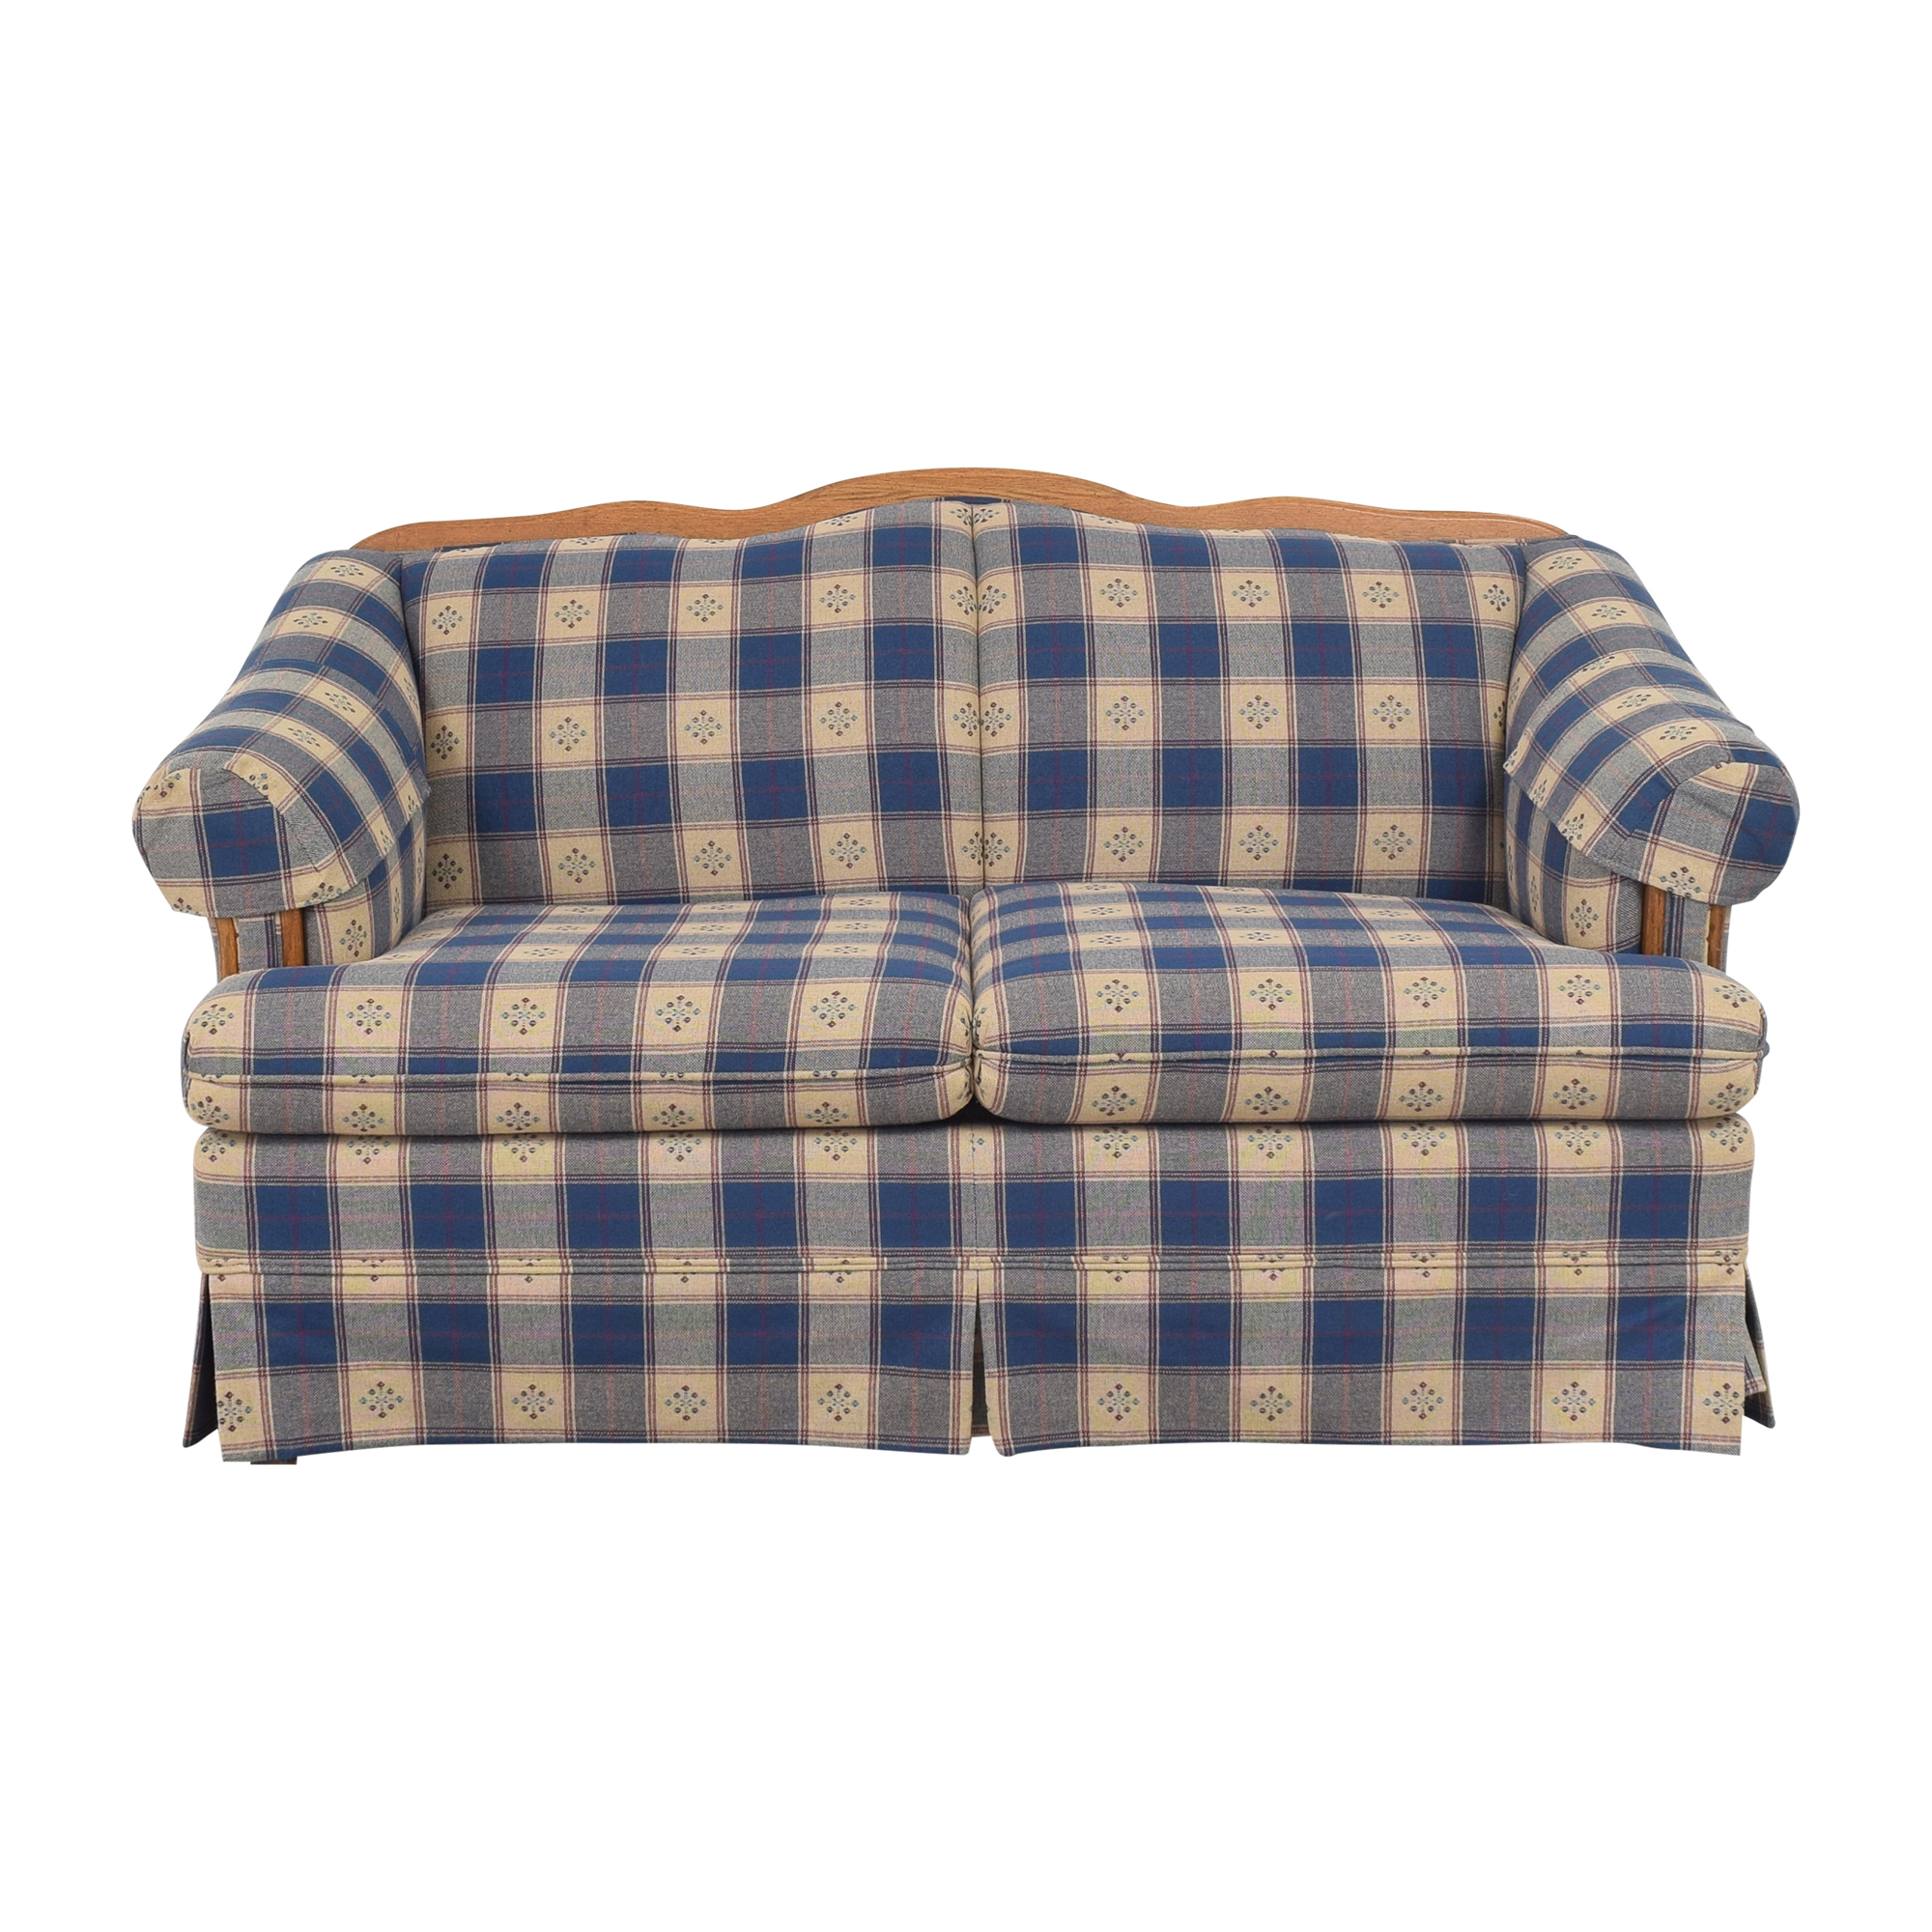 Broyhill Furniture Broyhill Furniture Roll Arm Loveseat